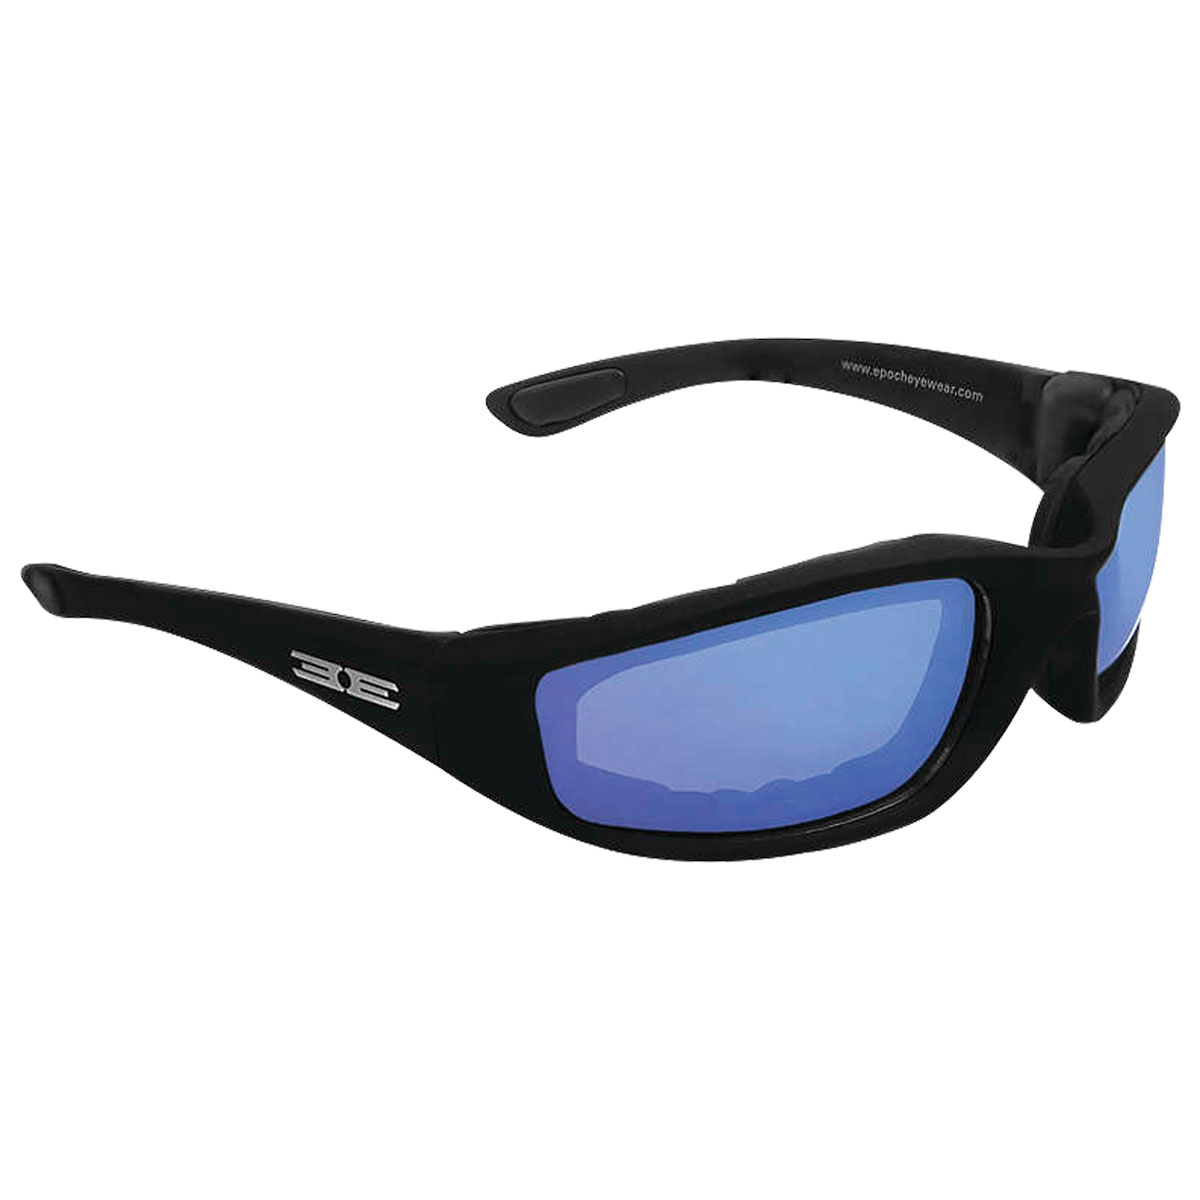 Epoch Eyewear Foam Black Sunglasses with Blue Mirror Lens